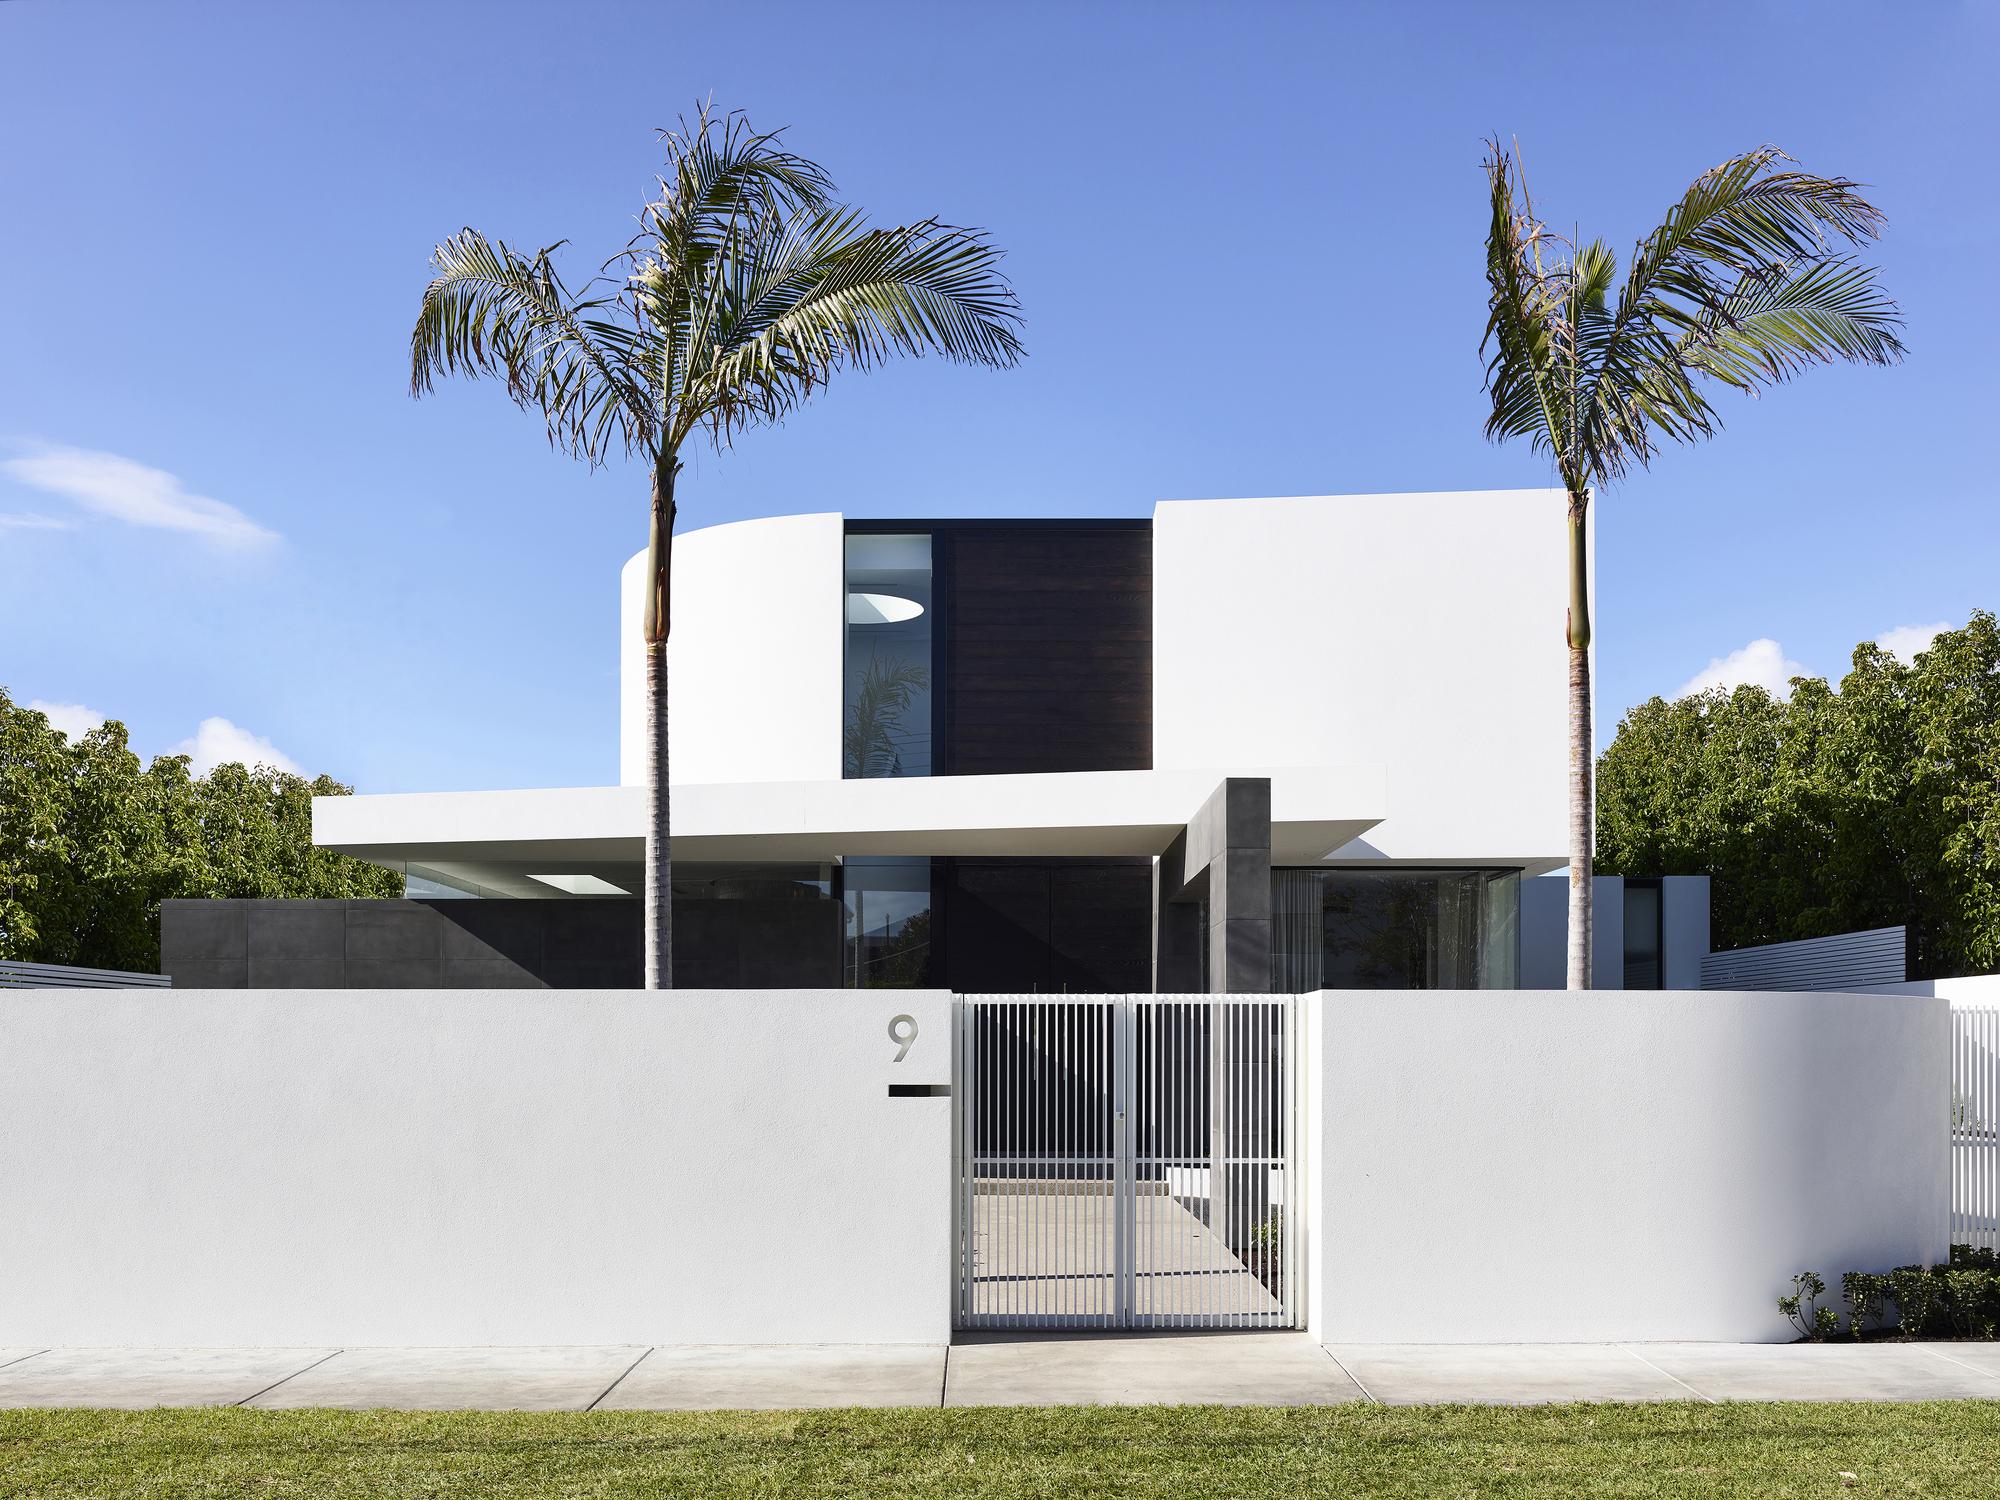 Resort House / Martin Friedrich Architects